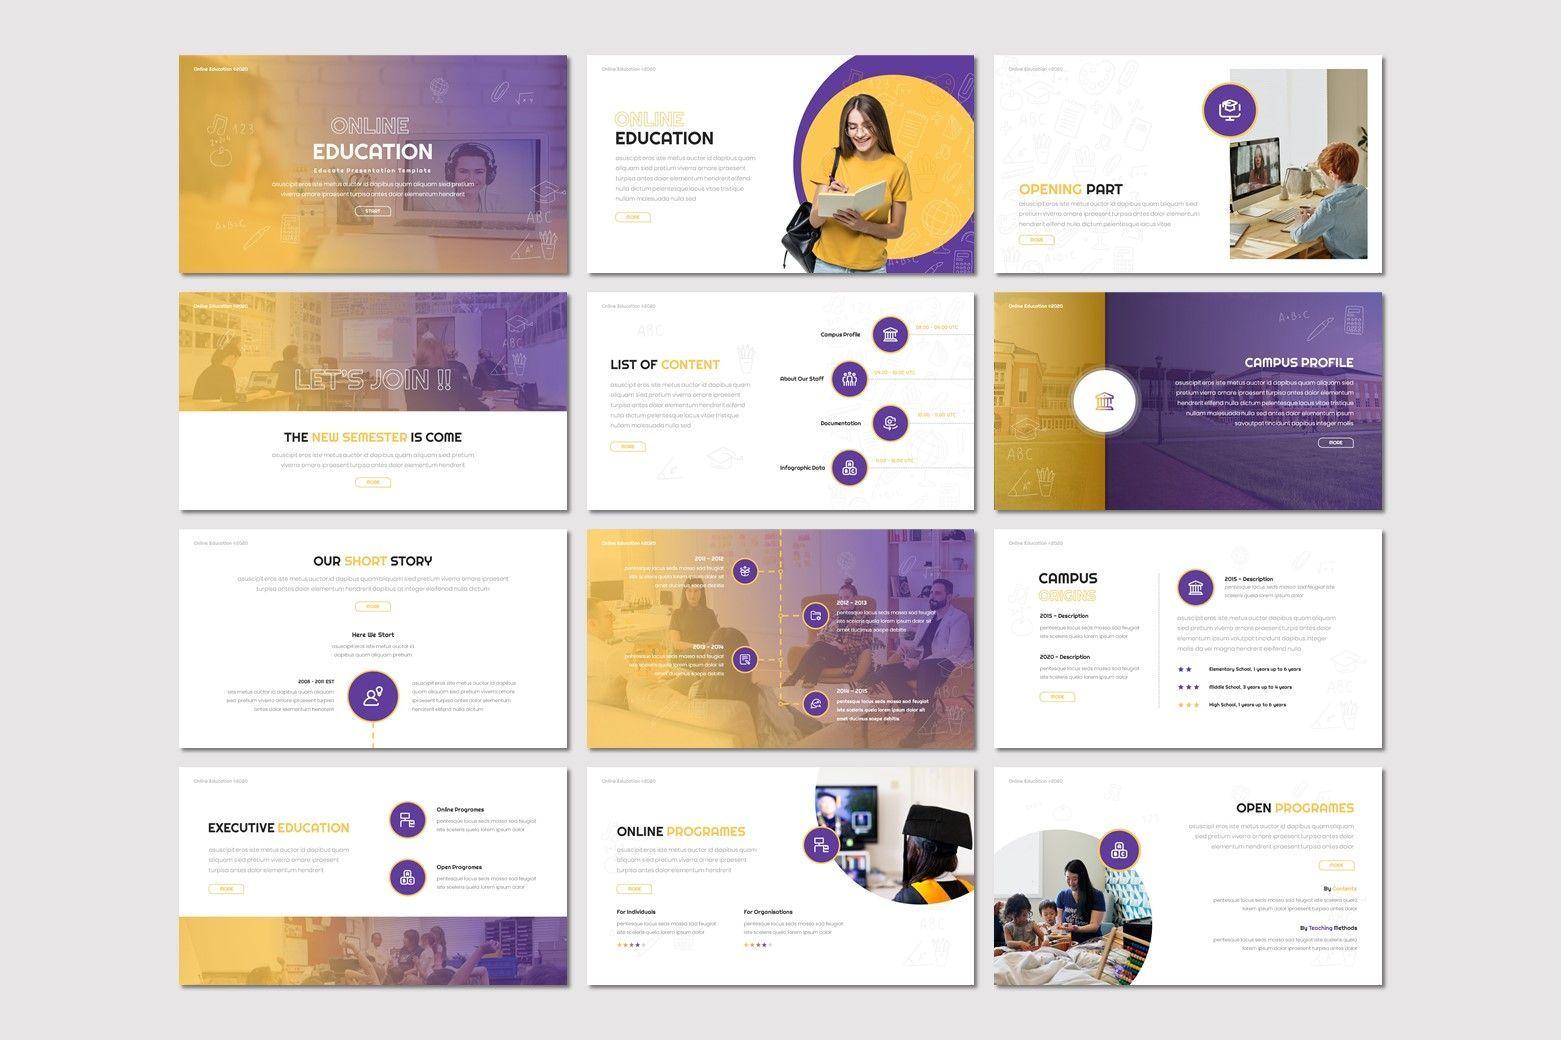 Online Education - Powerpoint Template, Slide 2, 08034, Presentation Templates — PoweredTemplate.com